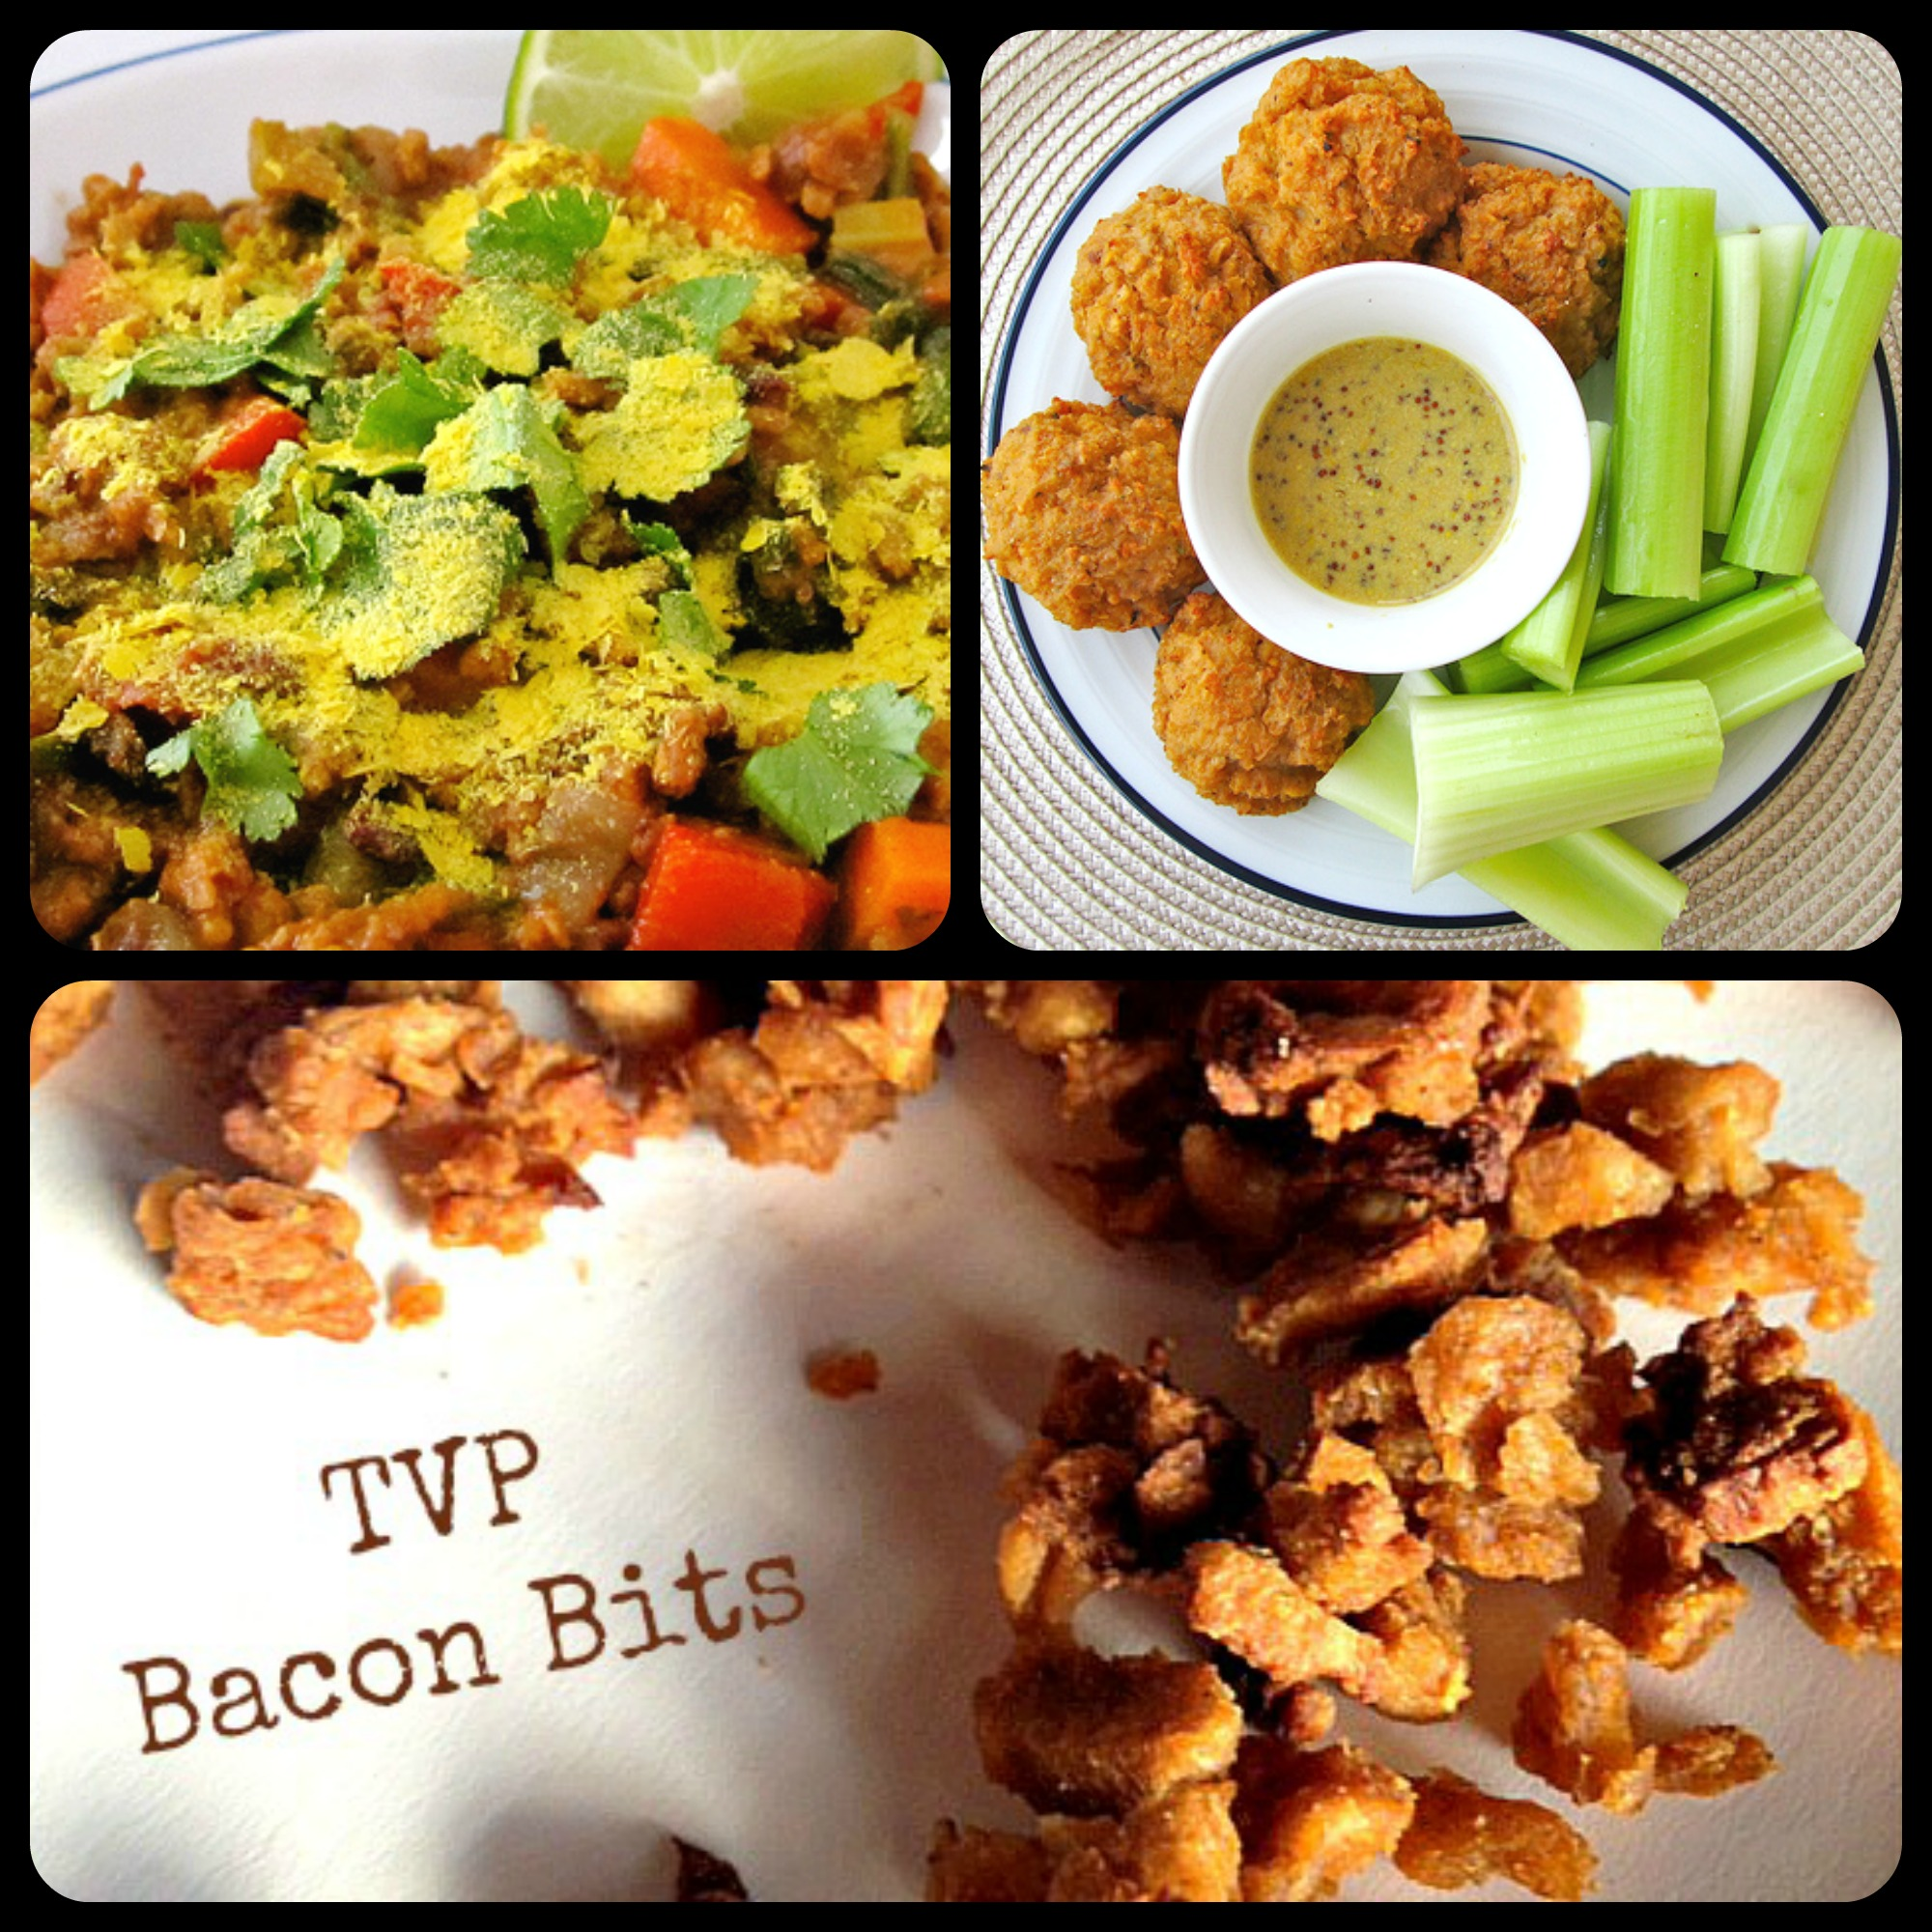 TVP Collage